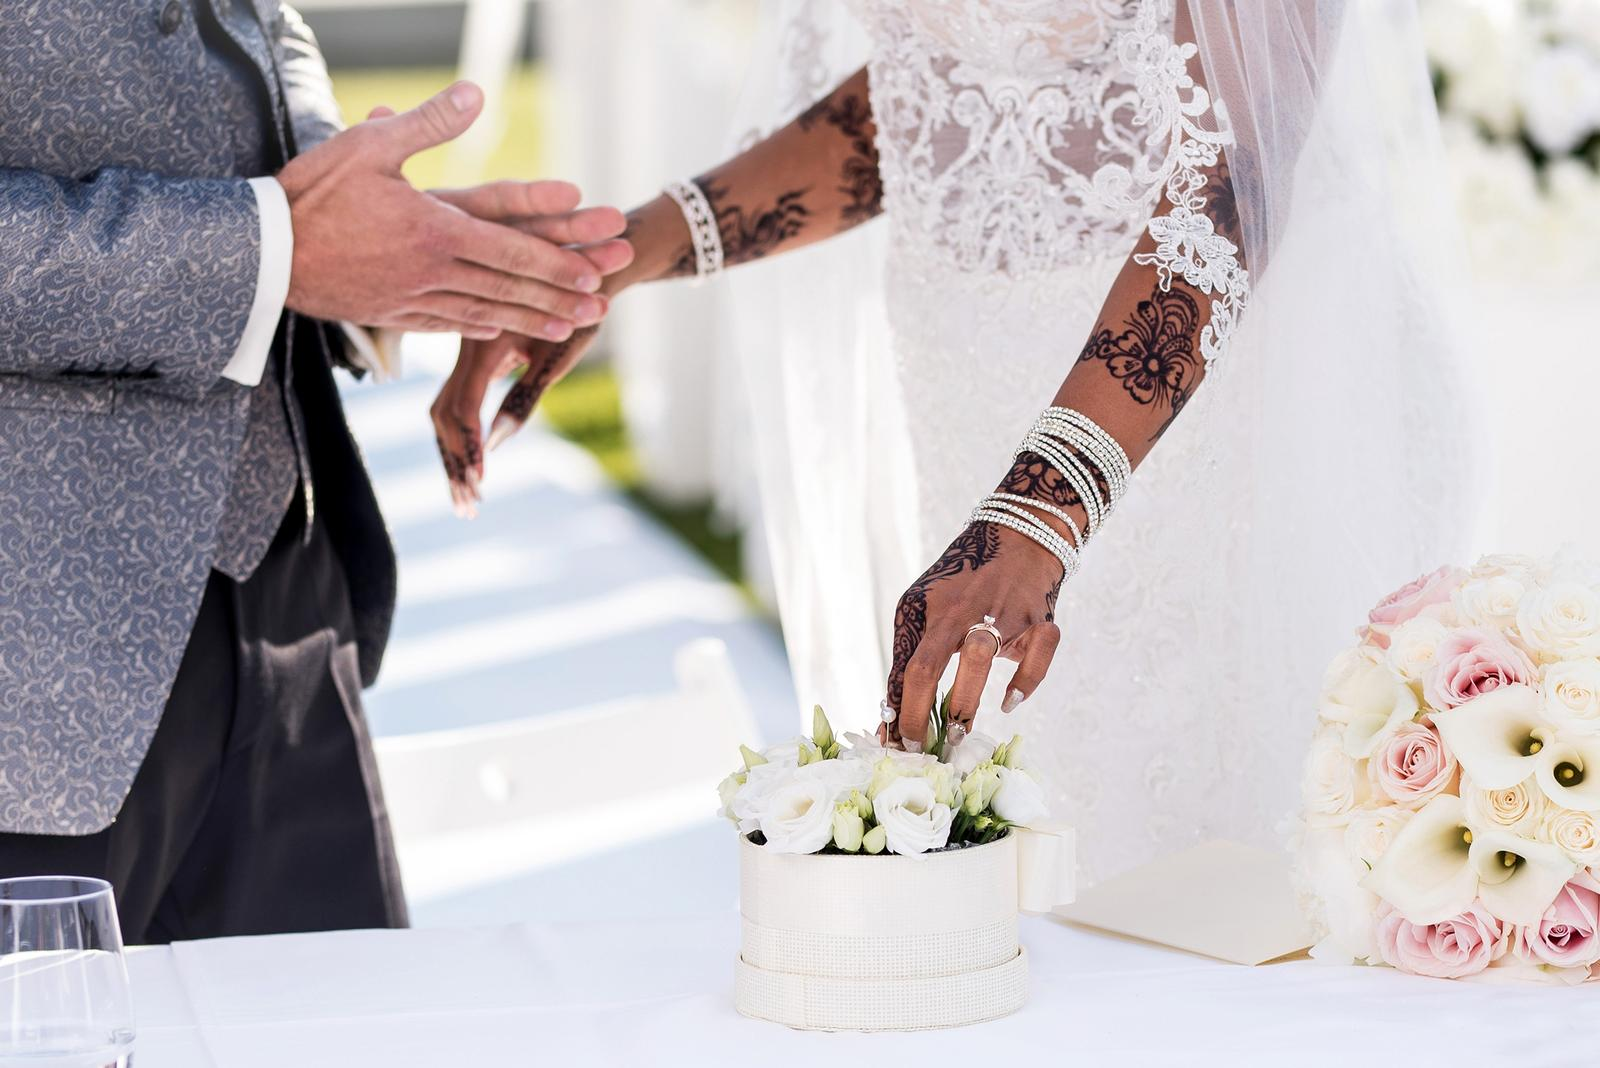 Svadba Zahra a Milan - Obrázok č. 41